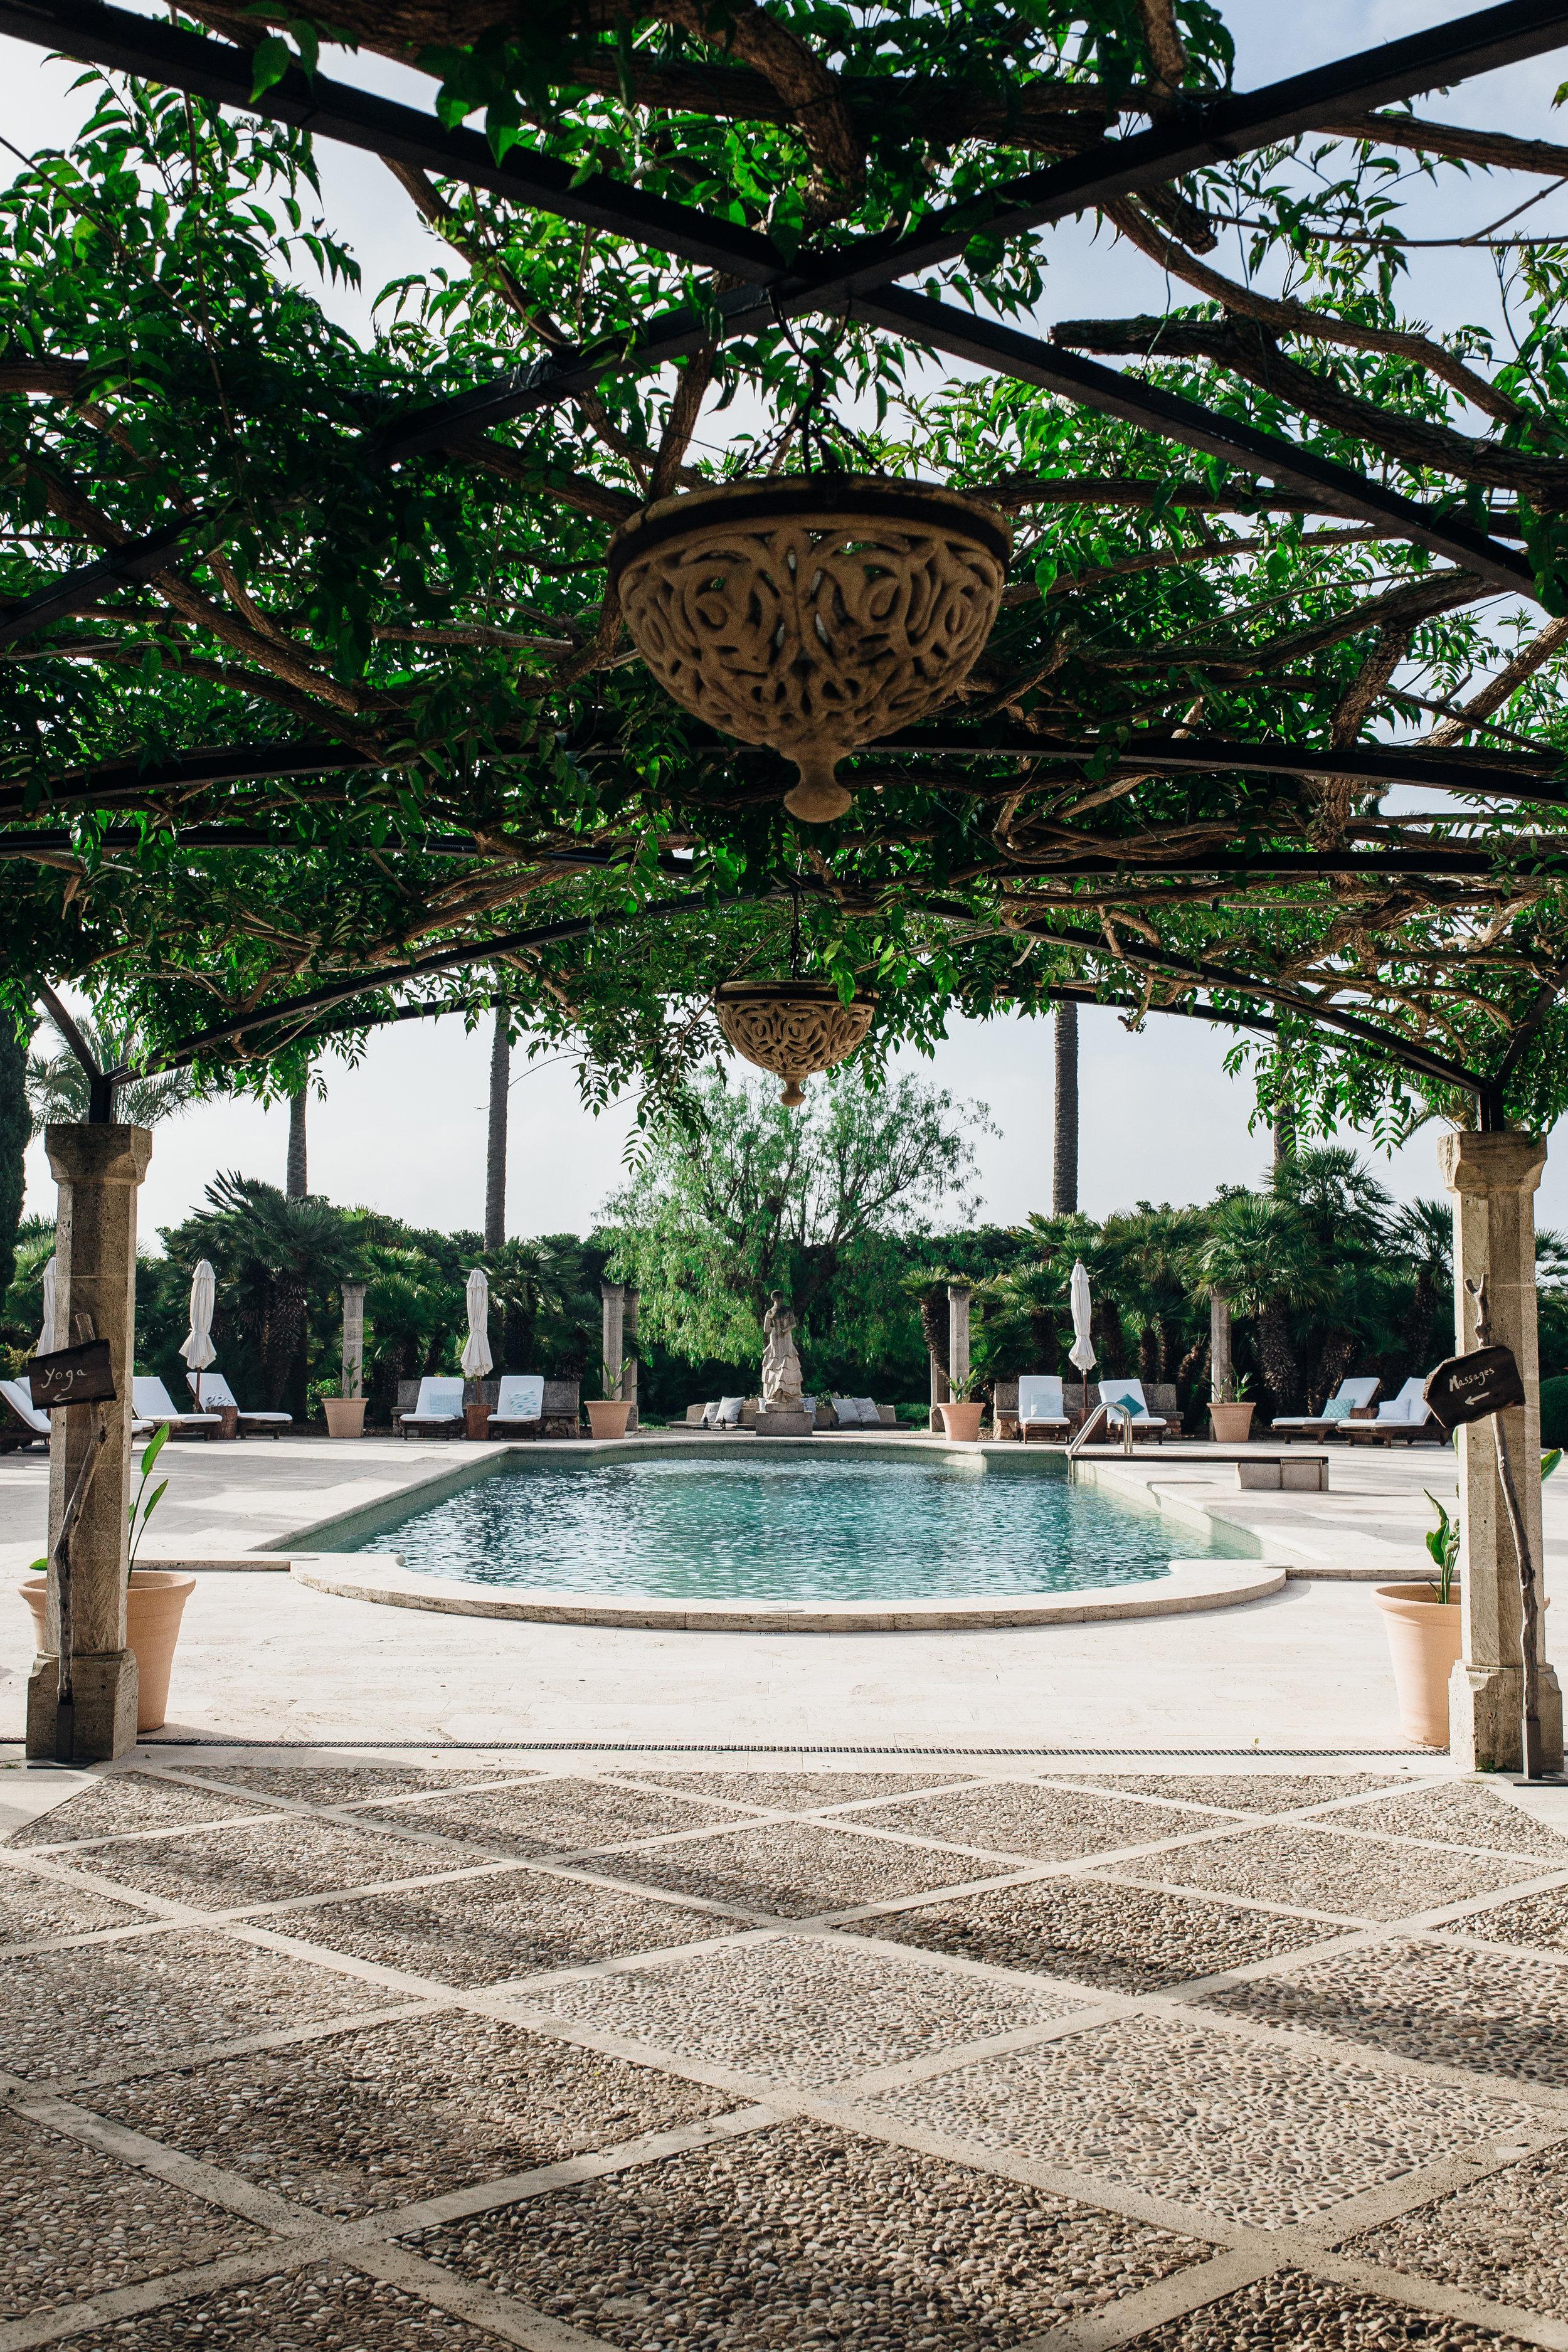 Cal_Reiet-Swimming_Pool_MALLORCA_IMG_1307.jpg